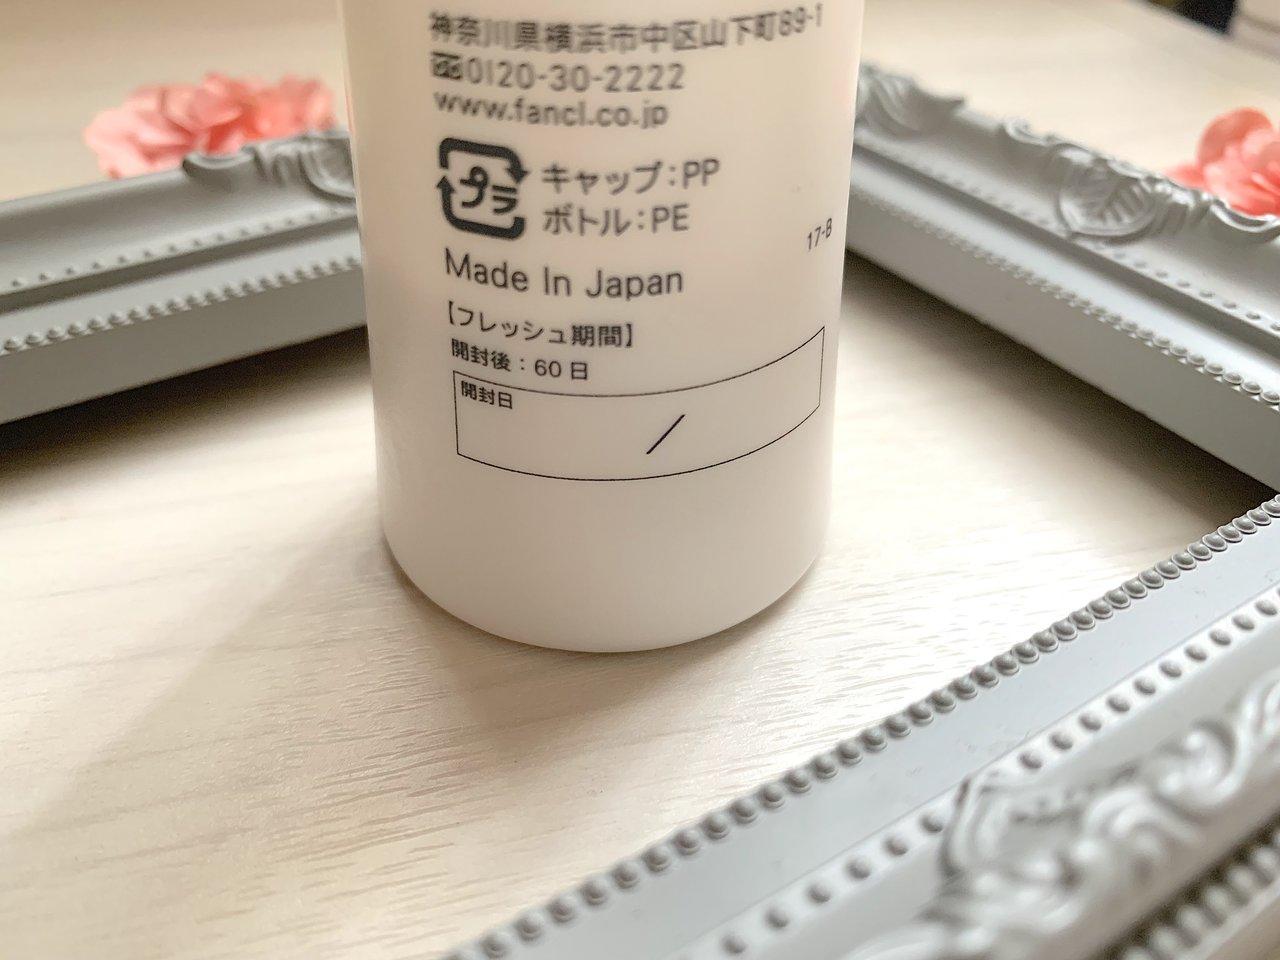 FANCL(ファンケル)  洗顔パウダー